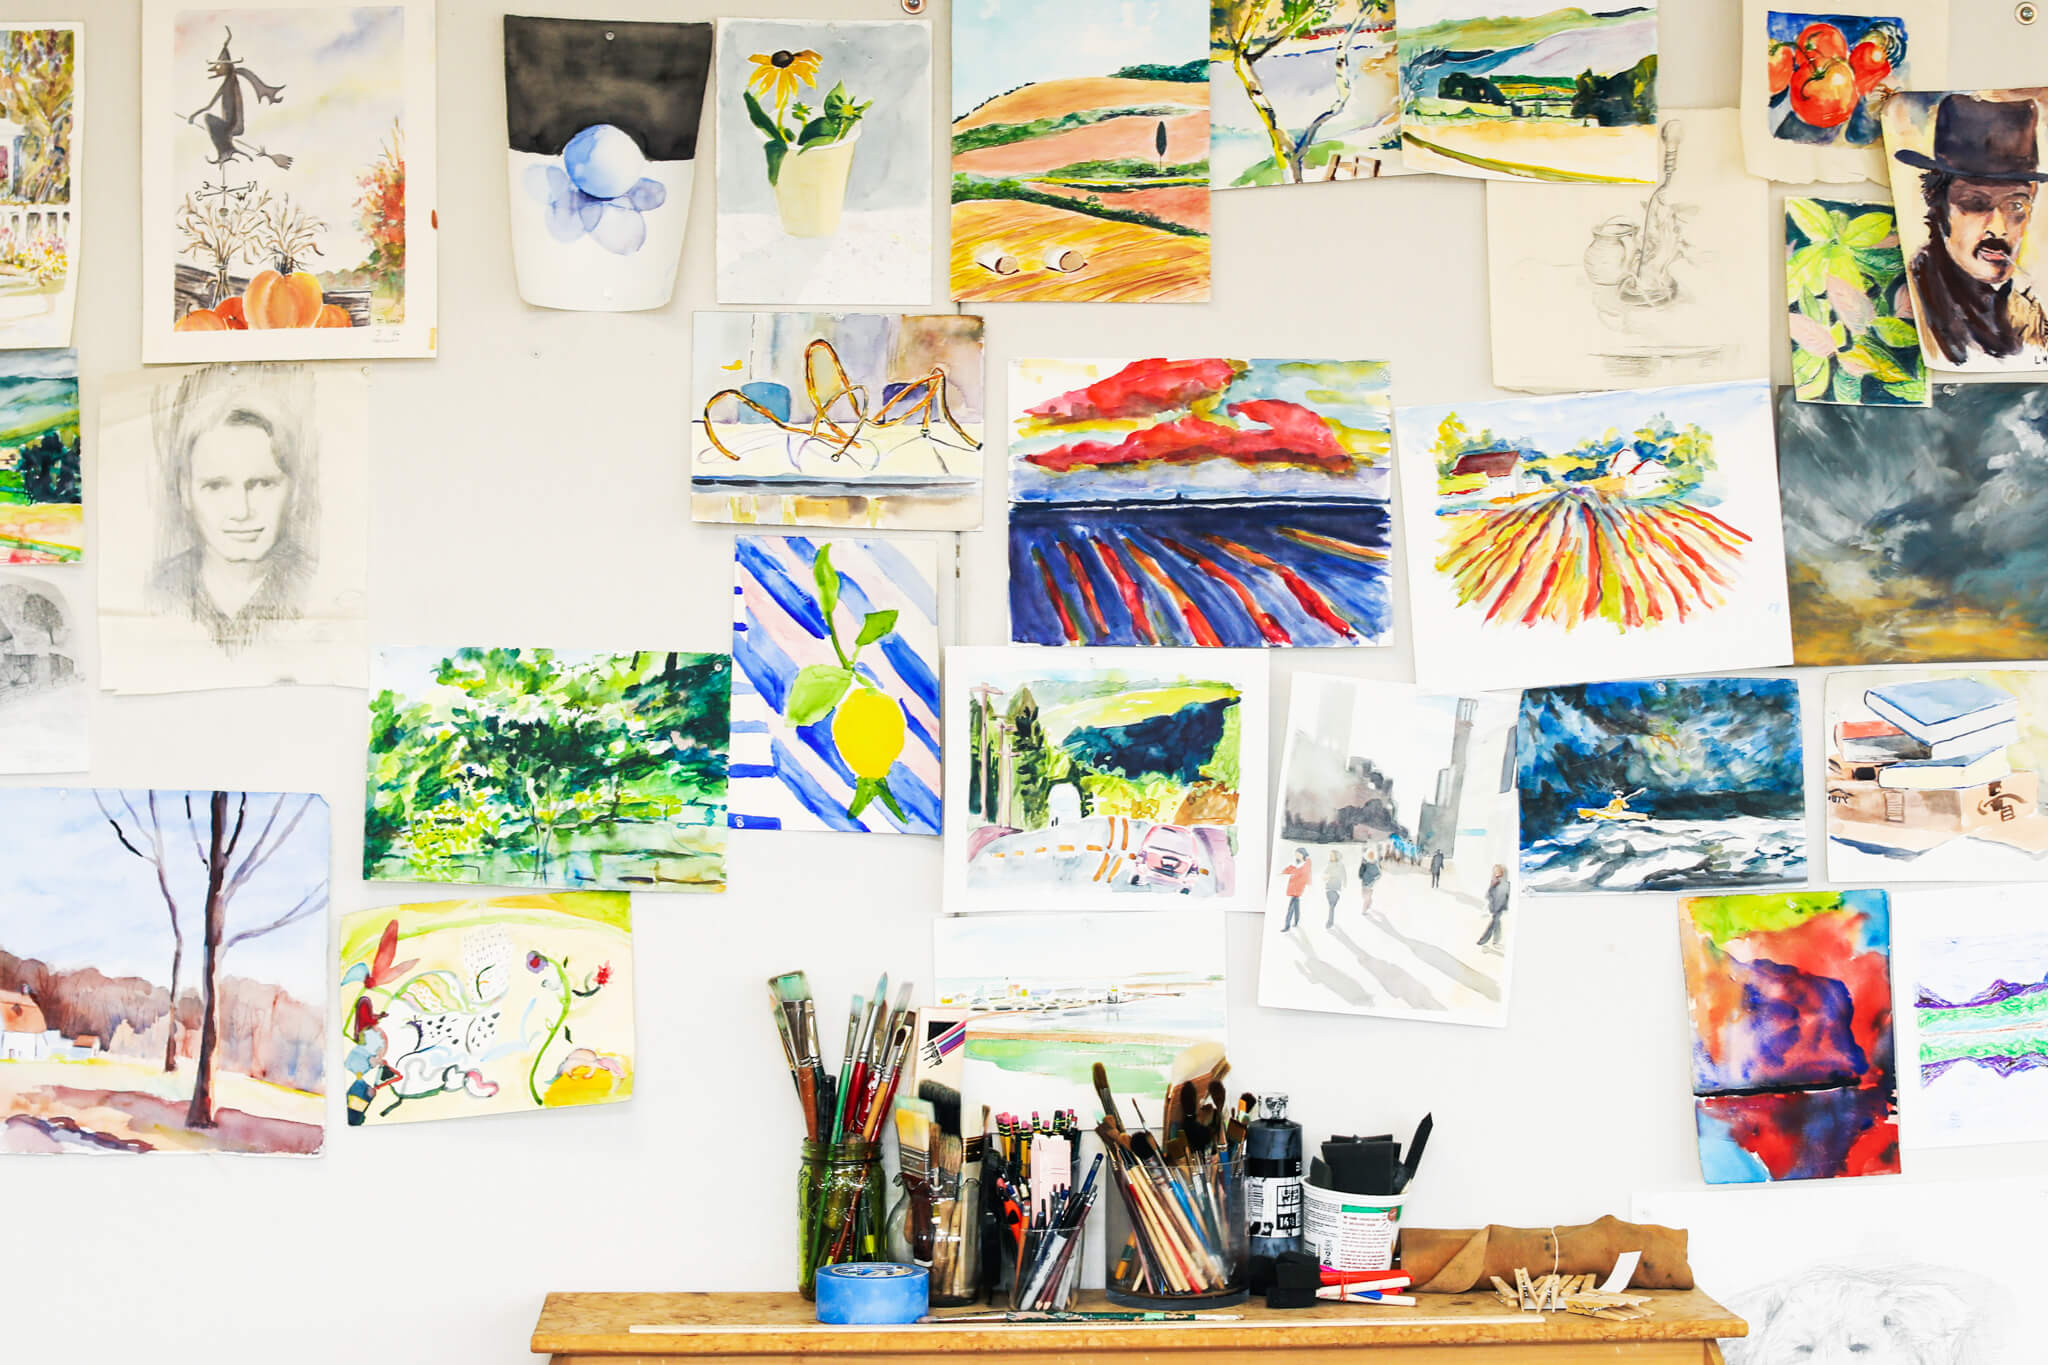 Wall of Watercolor Paintings